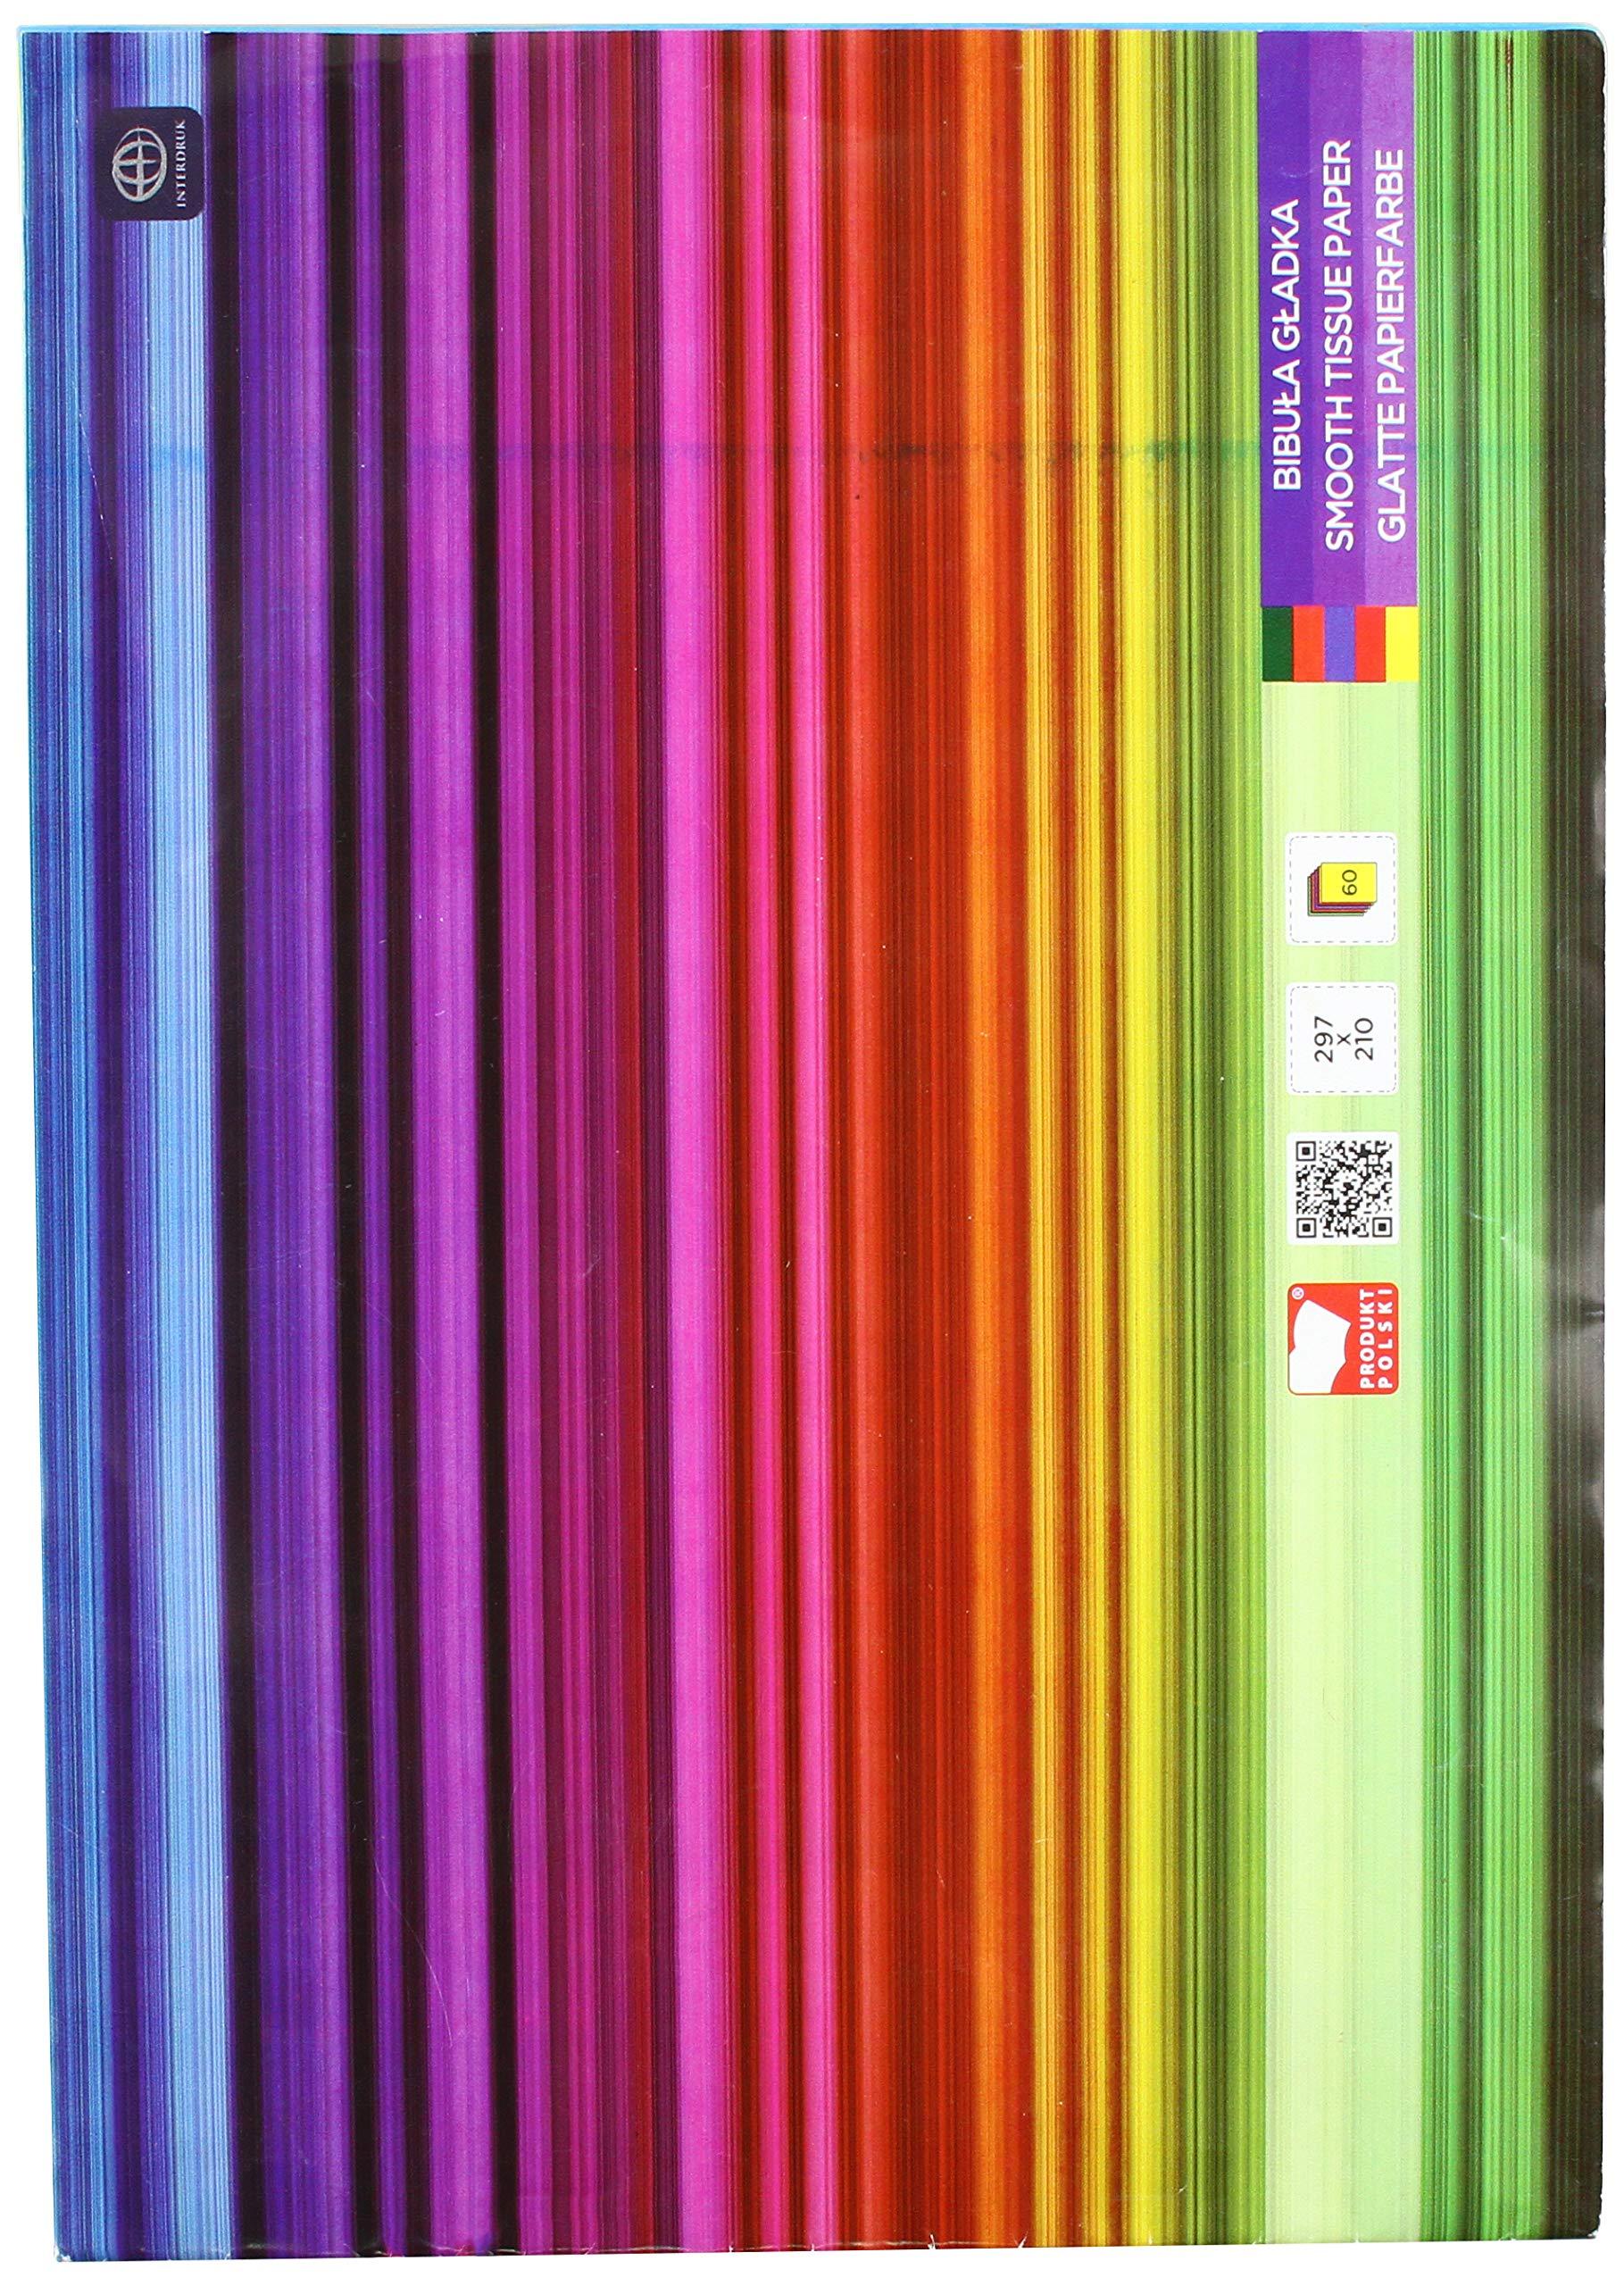 Interdruk BIZESZYT Tissue Paper (Exercise Book A4 60), Multi-Color by Interdruk